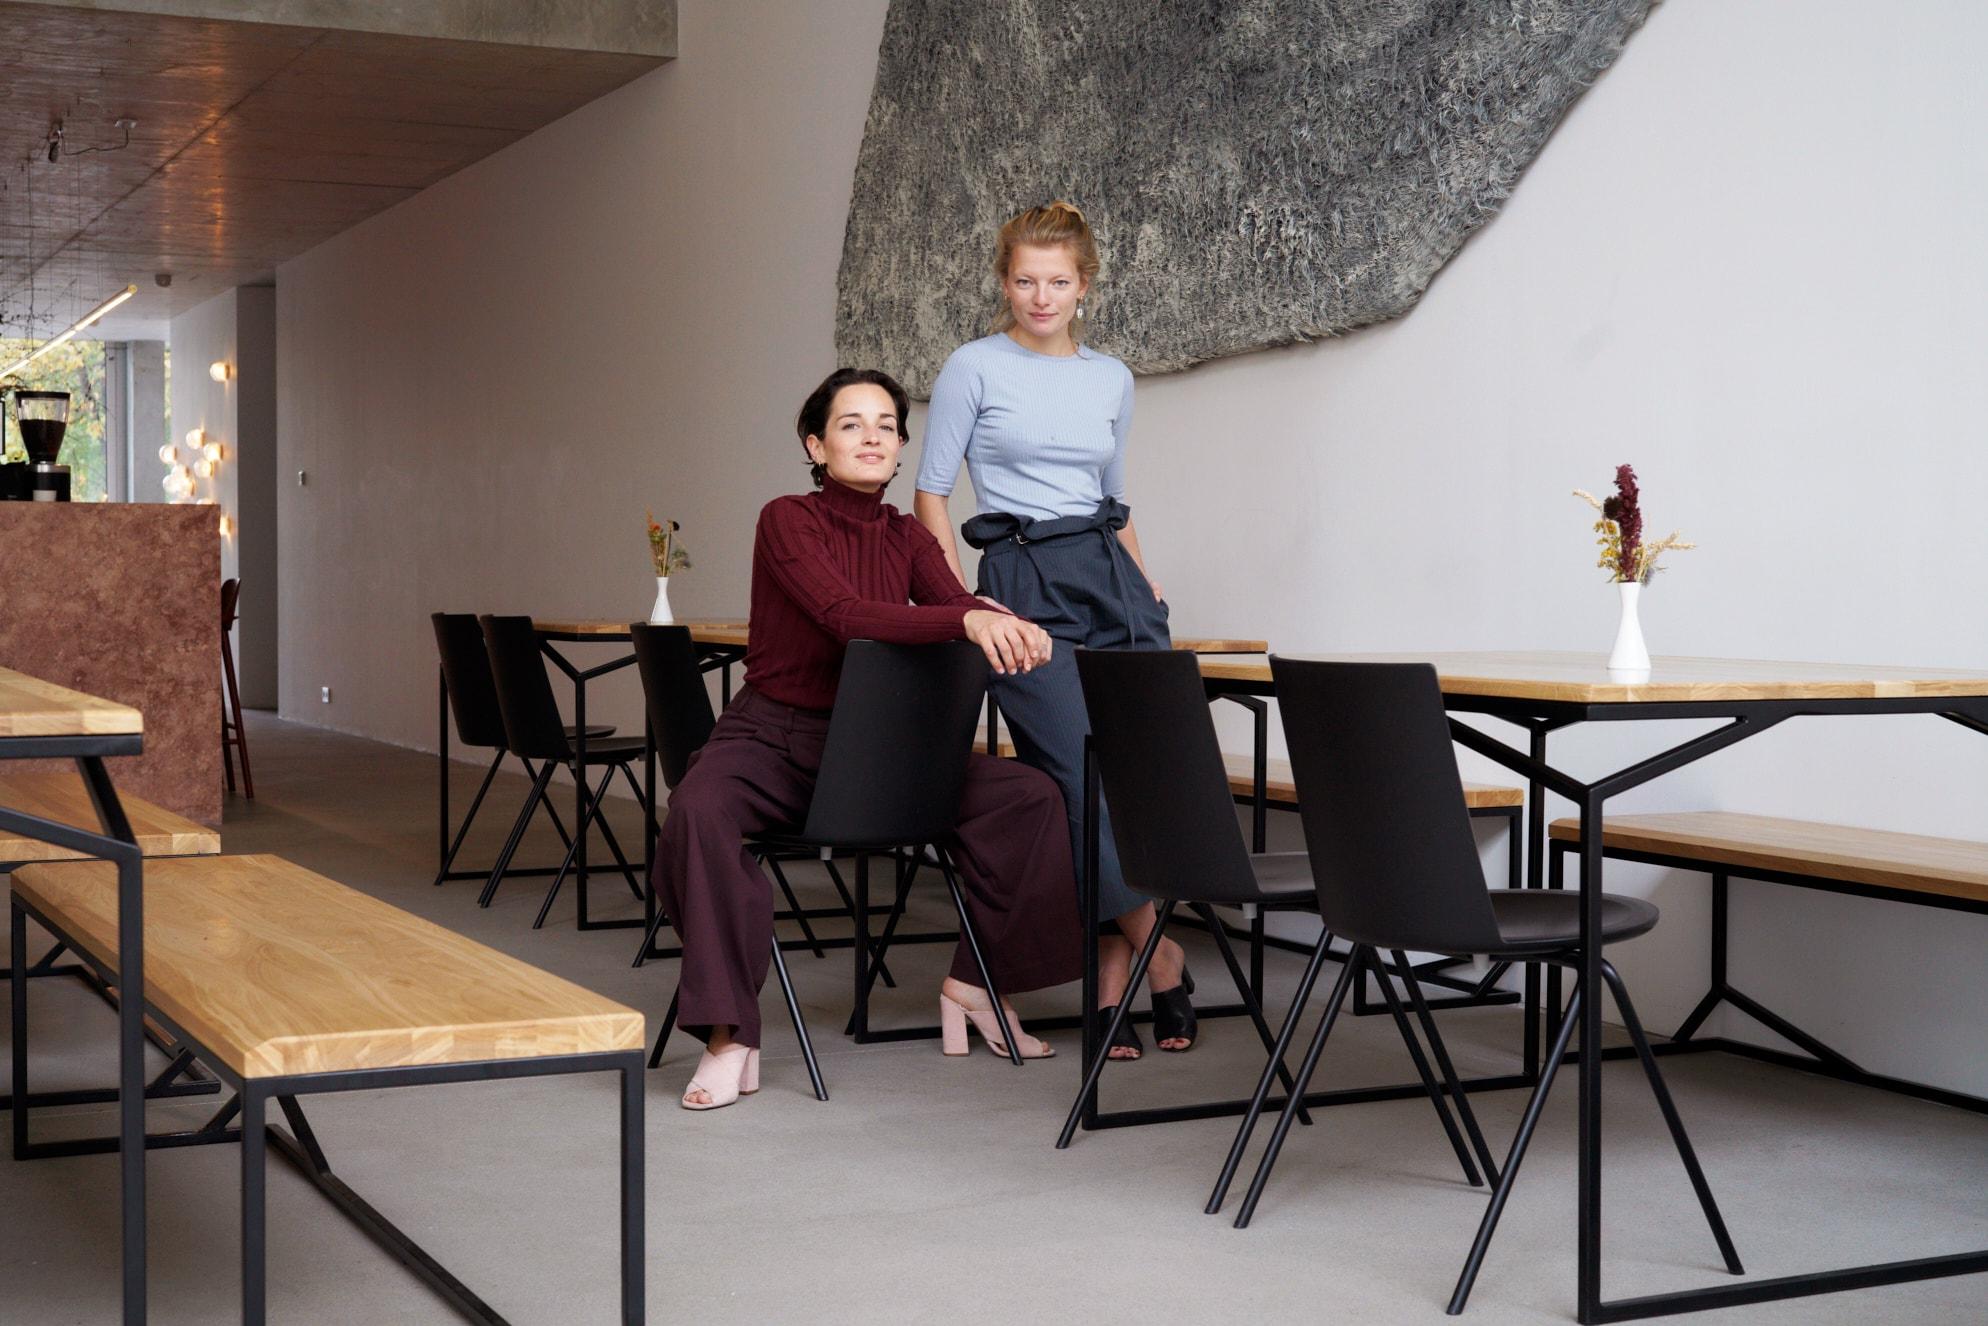 PAHR-Founders-Jessica-Joyce-Sidon-Caecilia-Baldszus